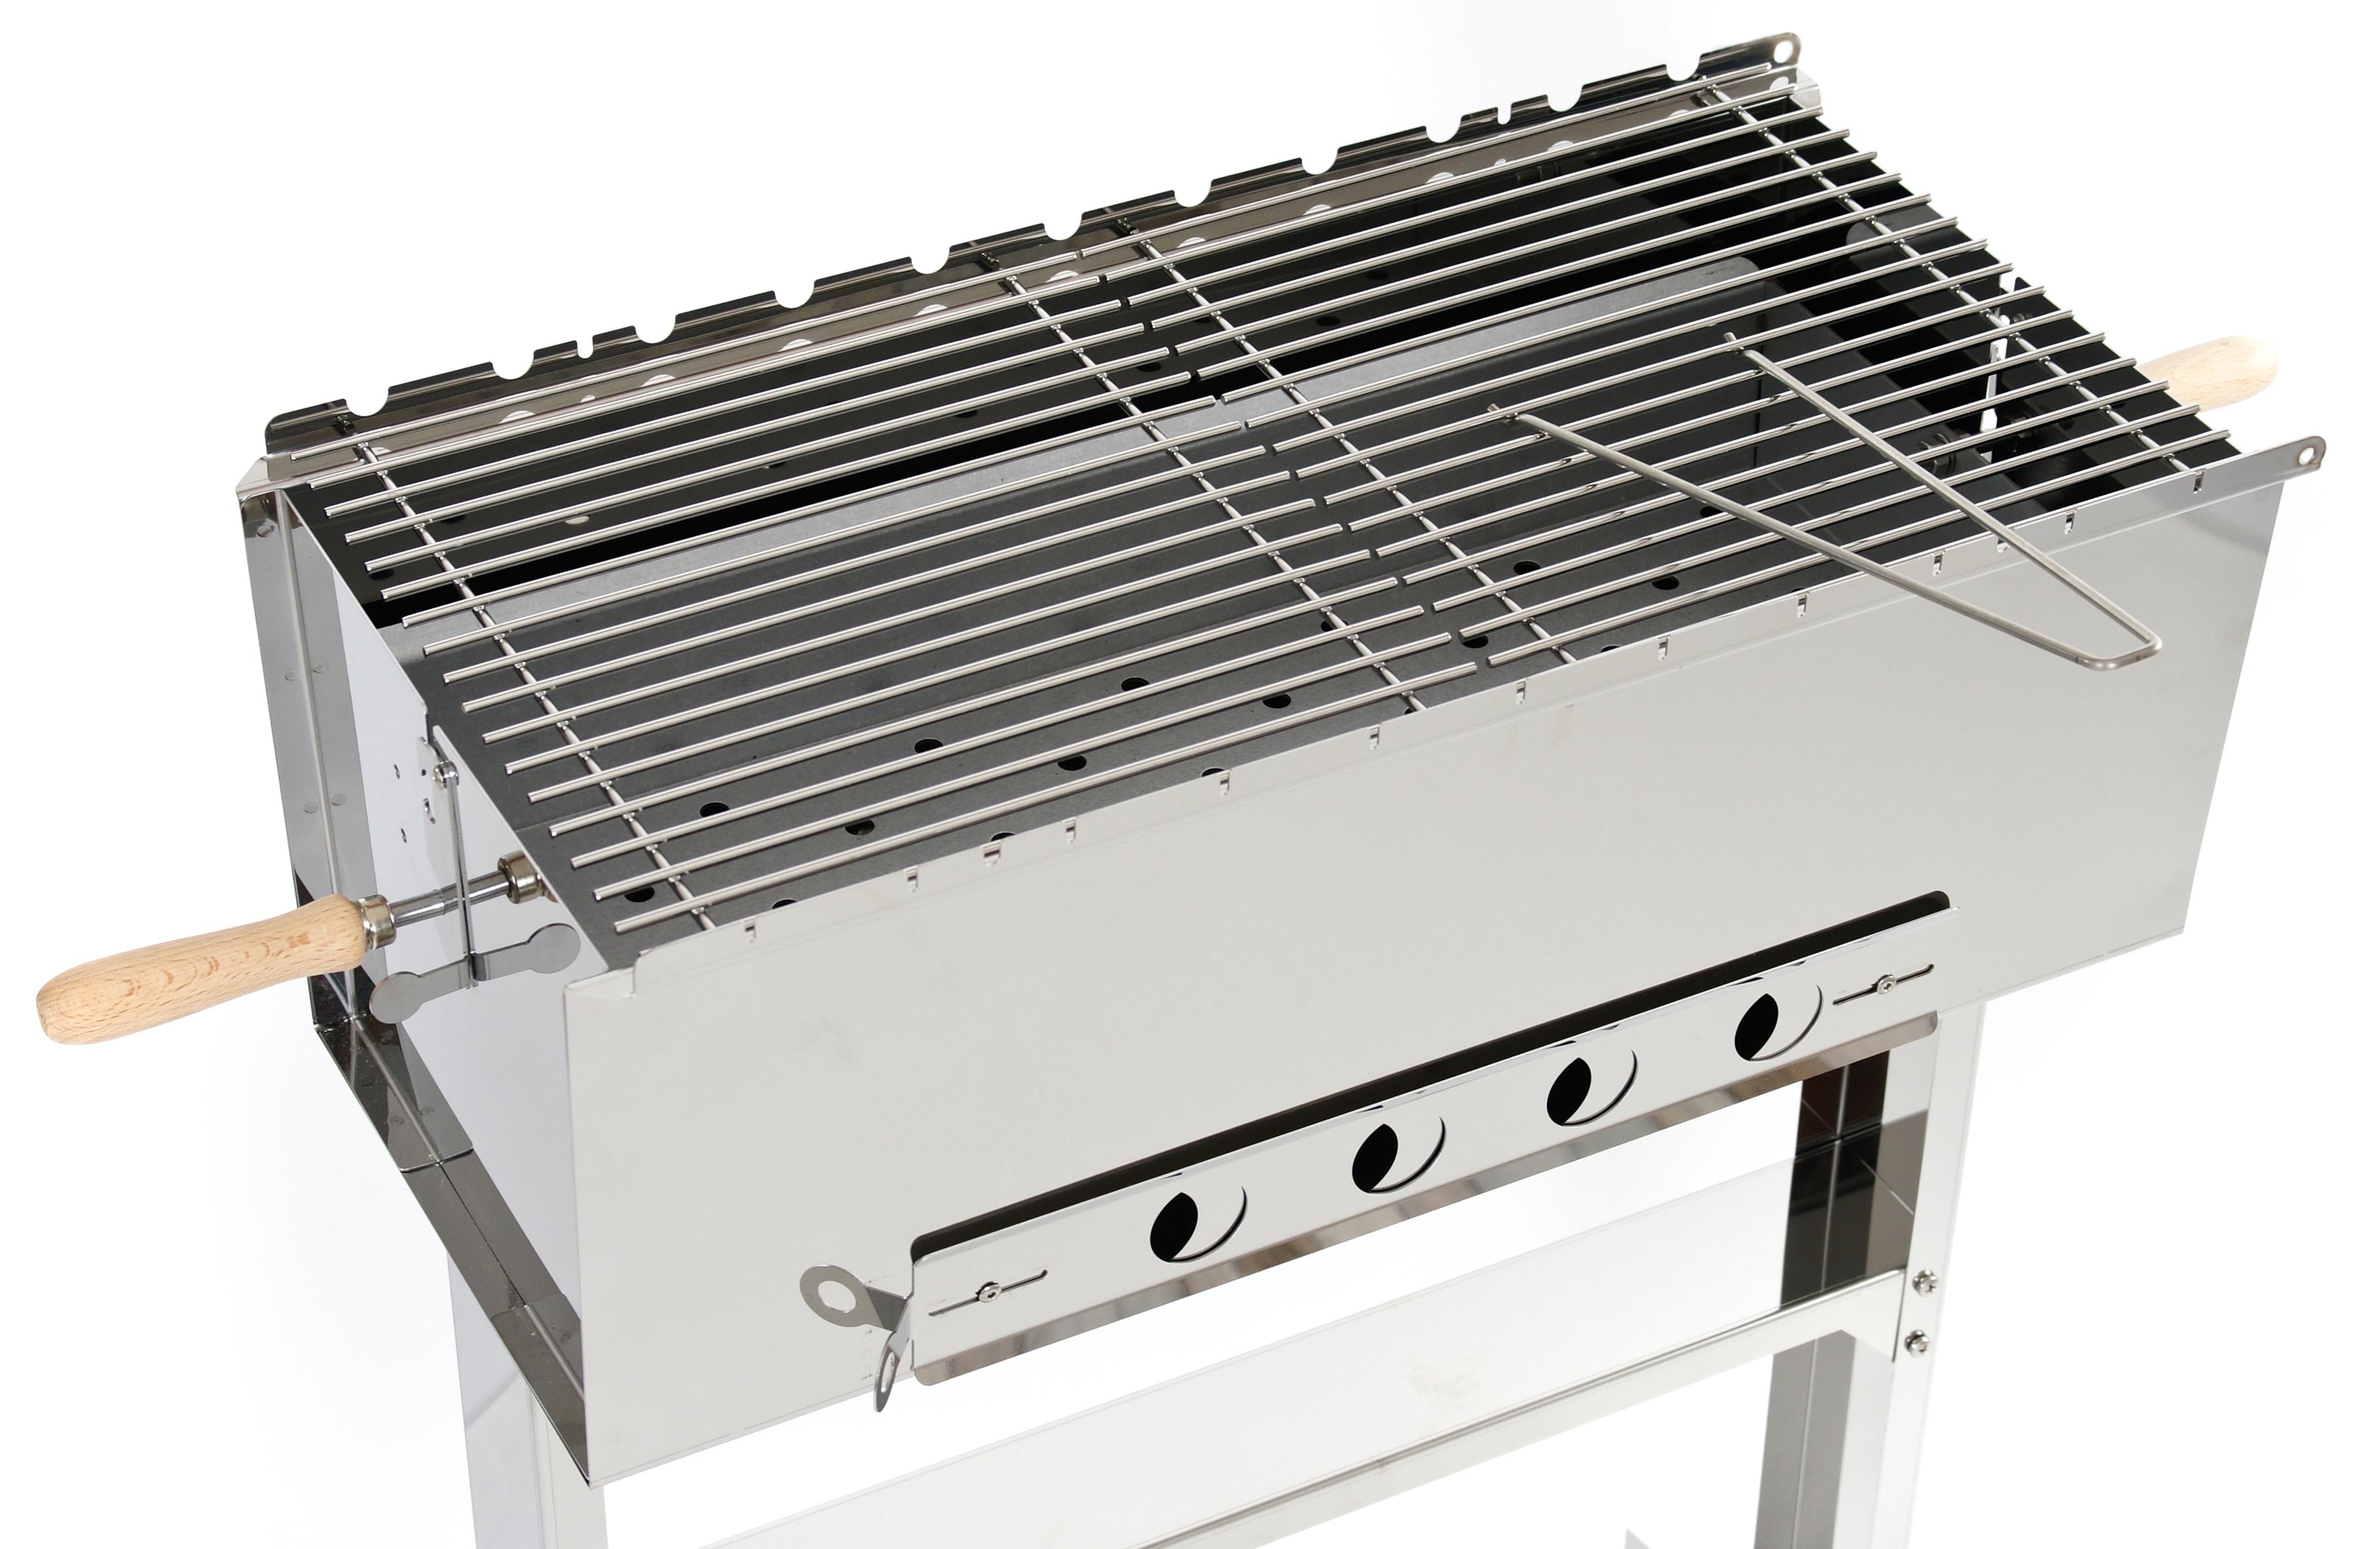 baikal premium edelstahl schaschlik grill mit ablage mangal ebay. Black Bedroom Furniture Sets. Home Design Ideas